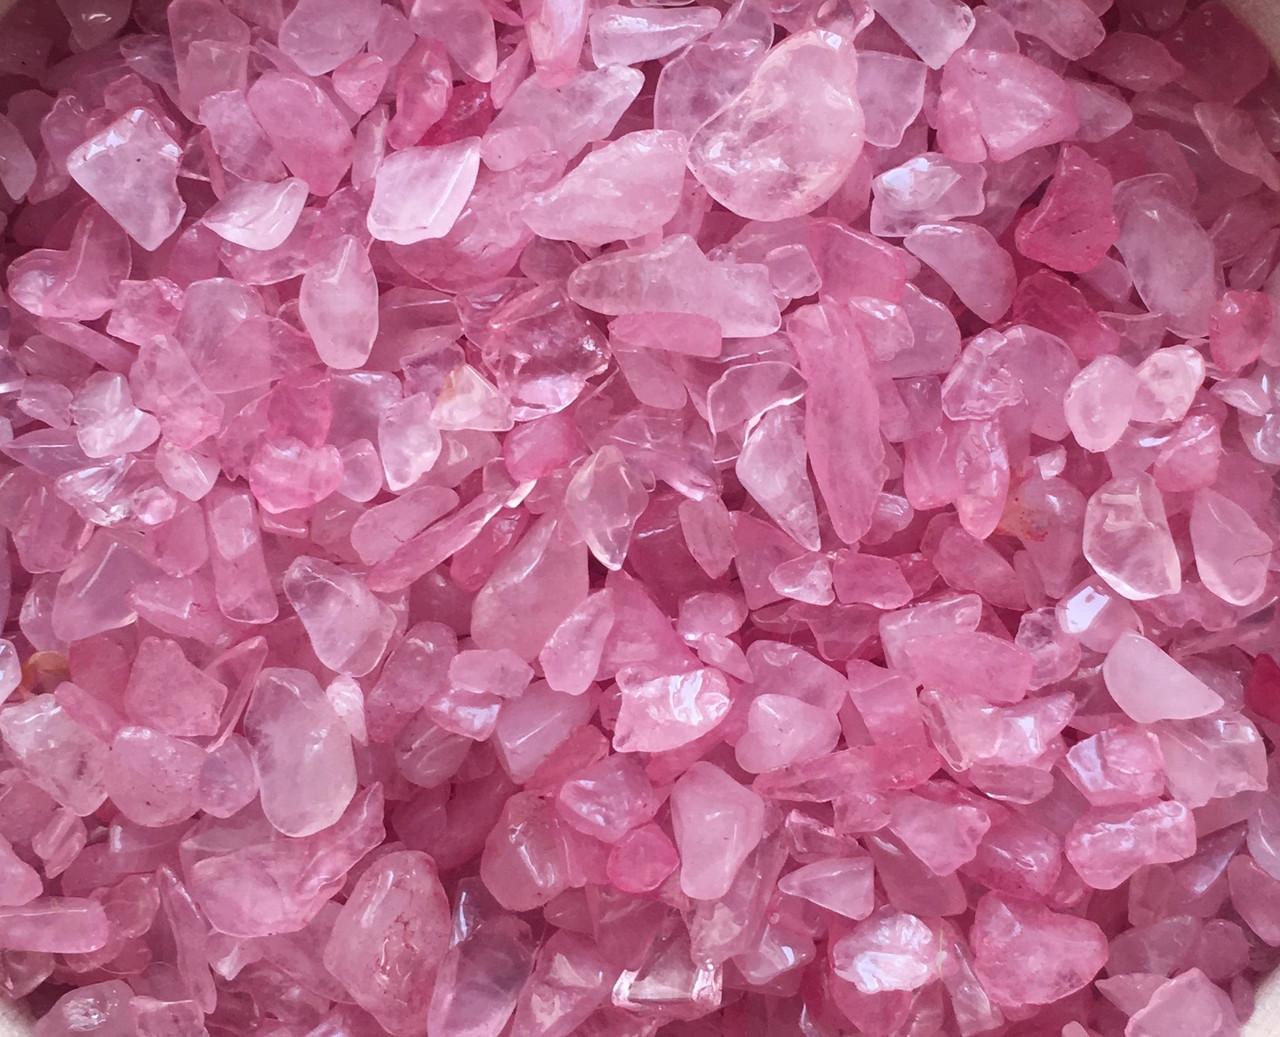 Натуральный камень крошка Розовый Кварц 3-5 мм (10 грамм)